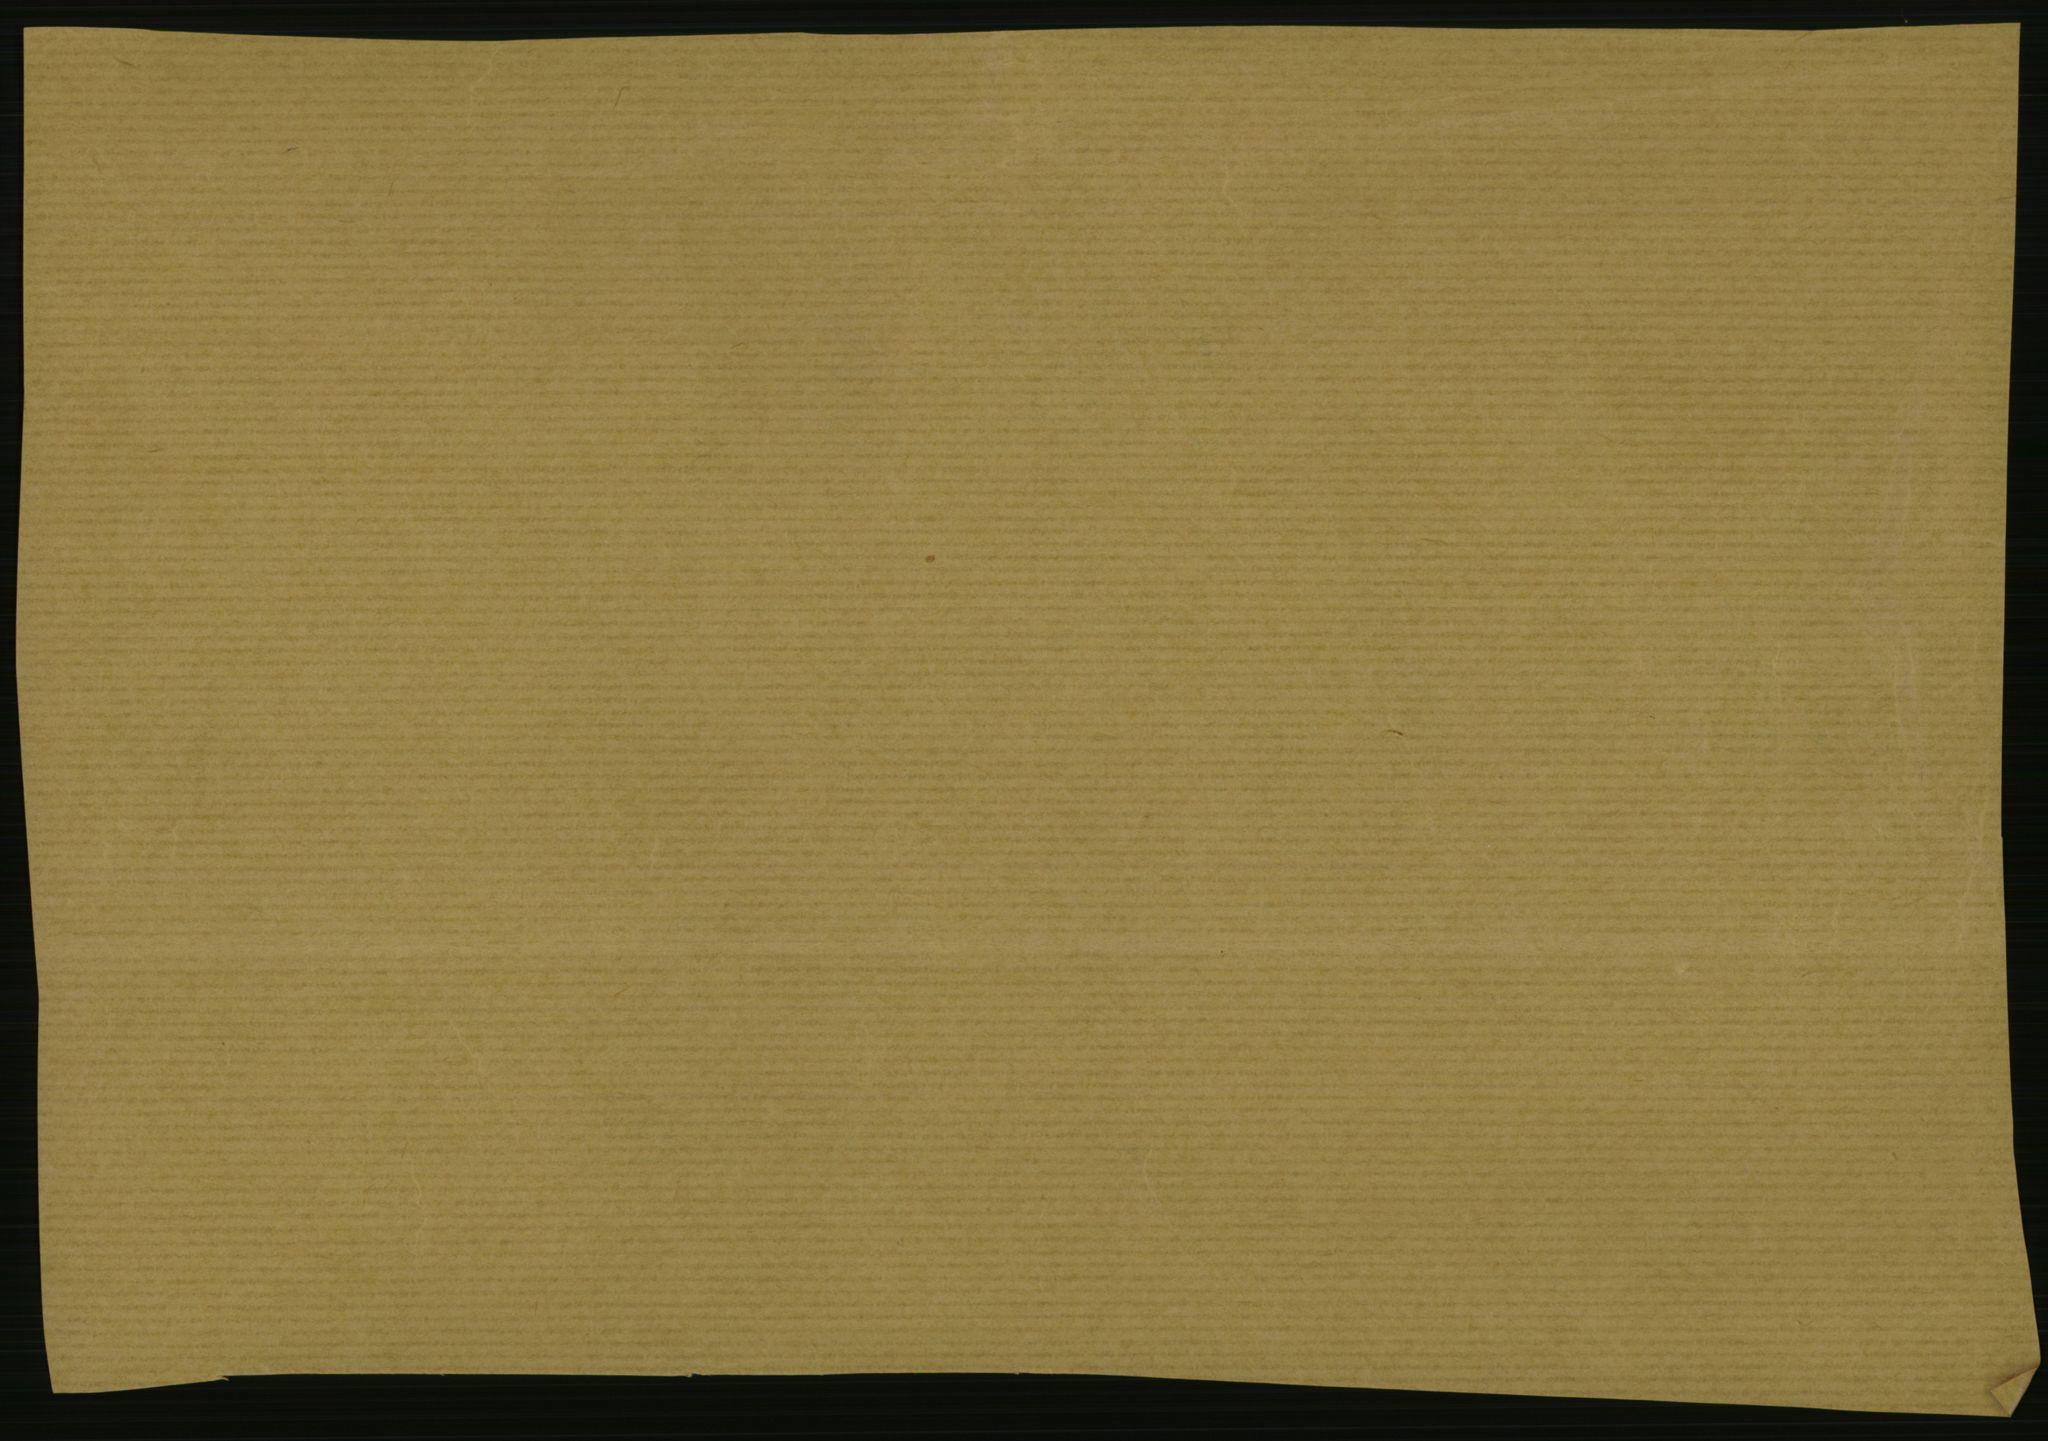 RA, Statistisk sentralbyrå, Sosiodemografiske emner, Befolkning, D/Df/Dfa/Dfaa/L0009: Bratsberg amt: Fødte, gifte, døde, 1903, s. 2